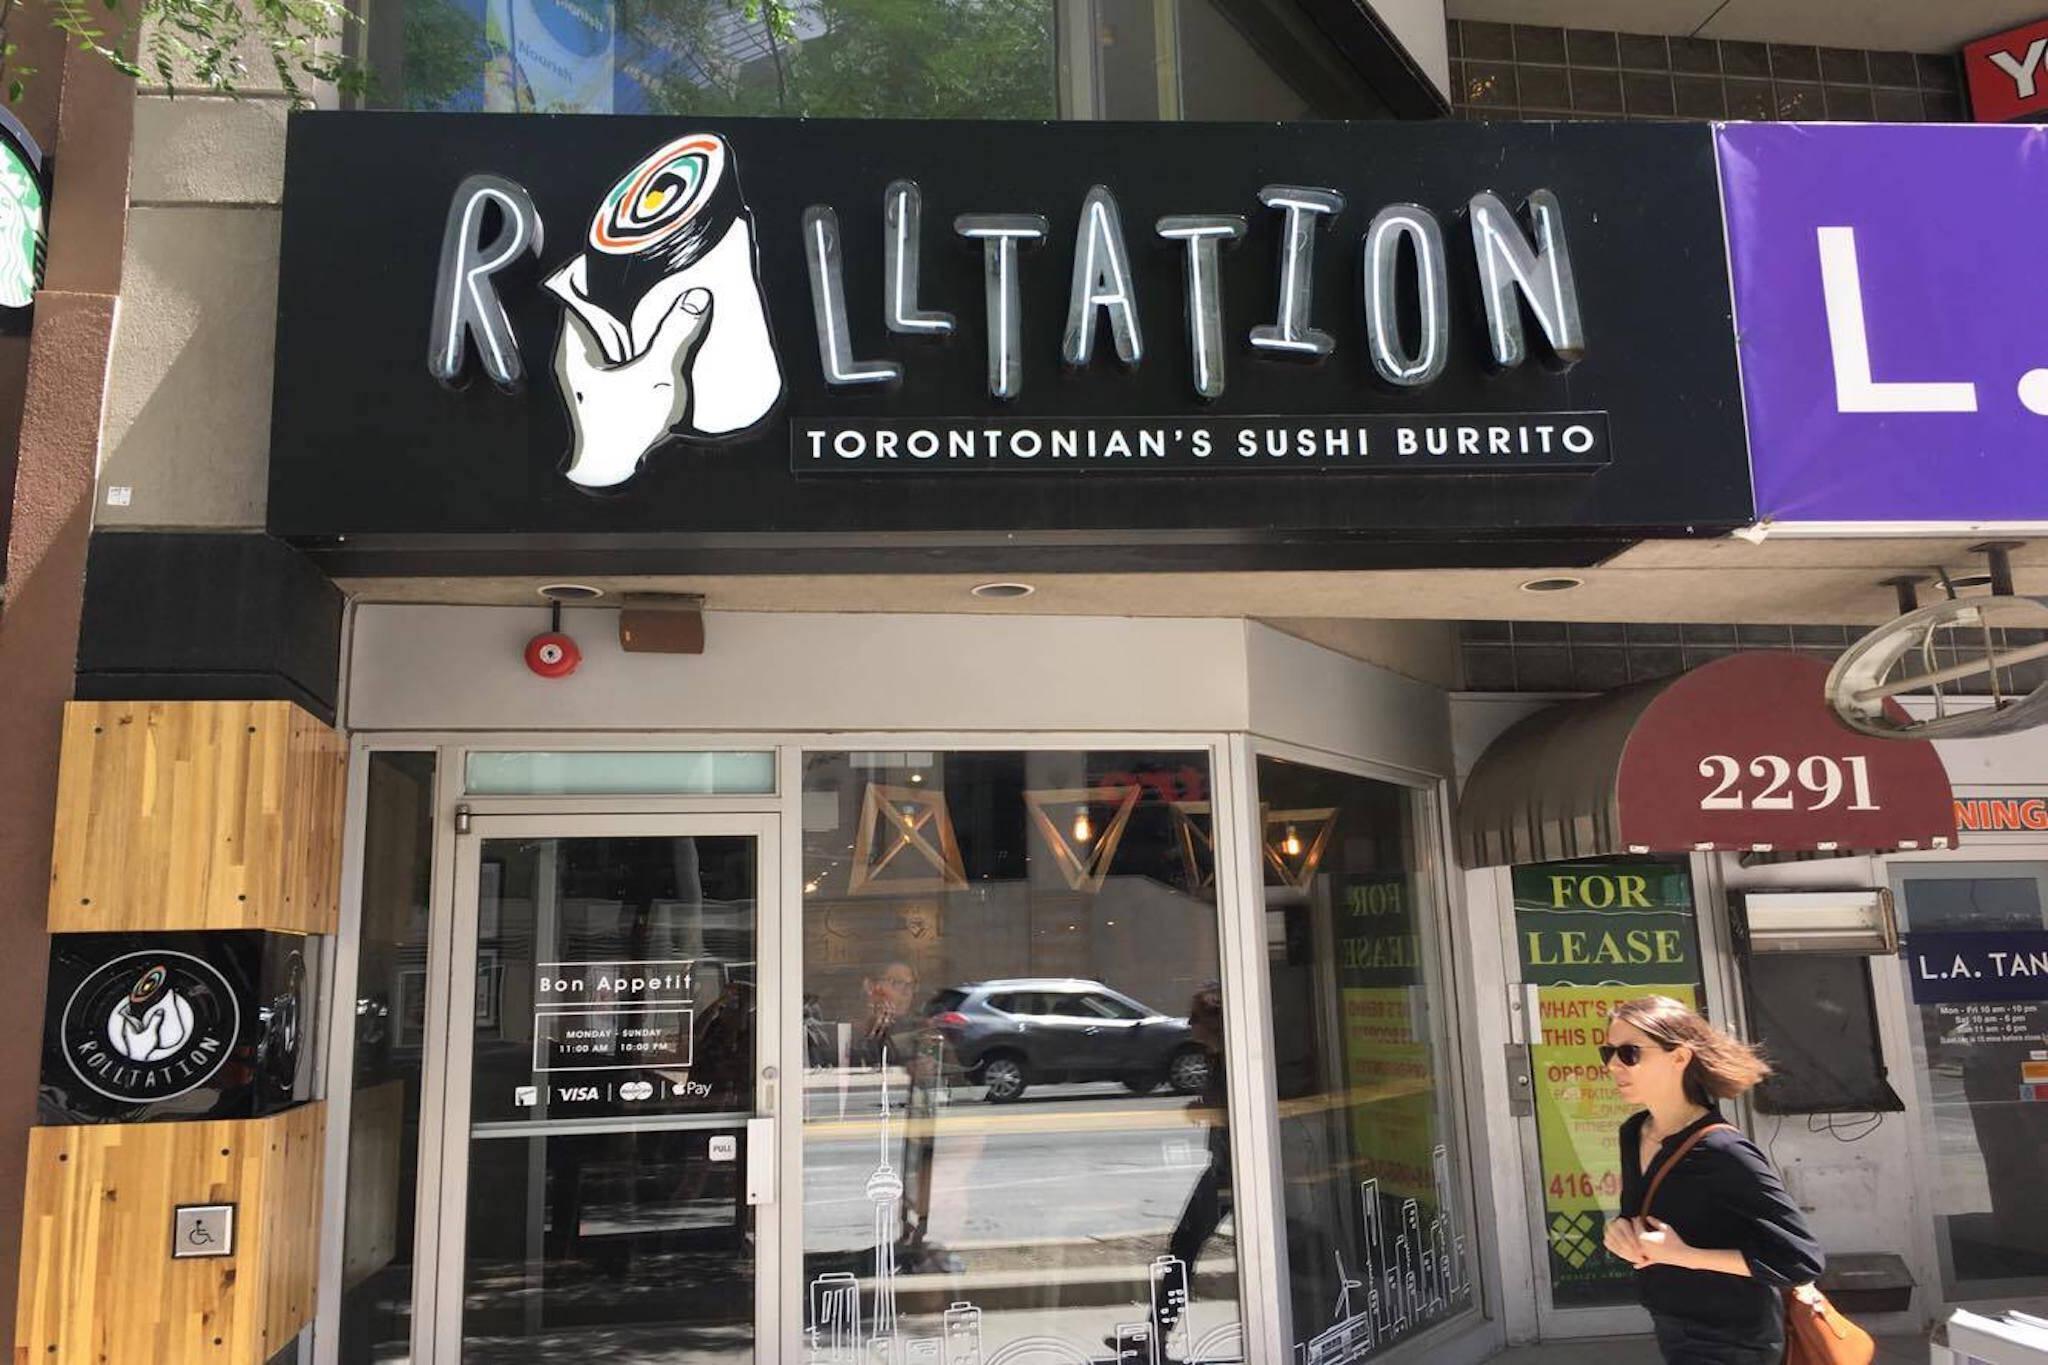 Rolltation Toronto